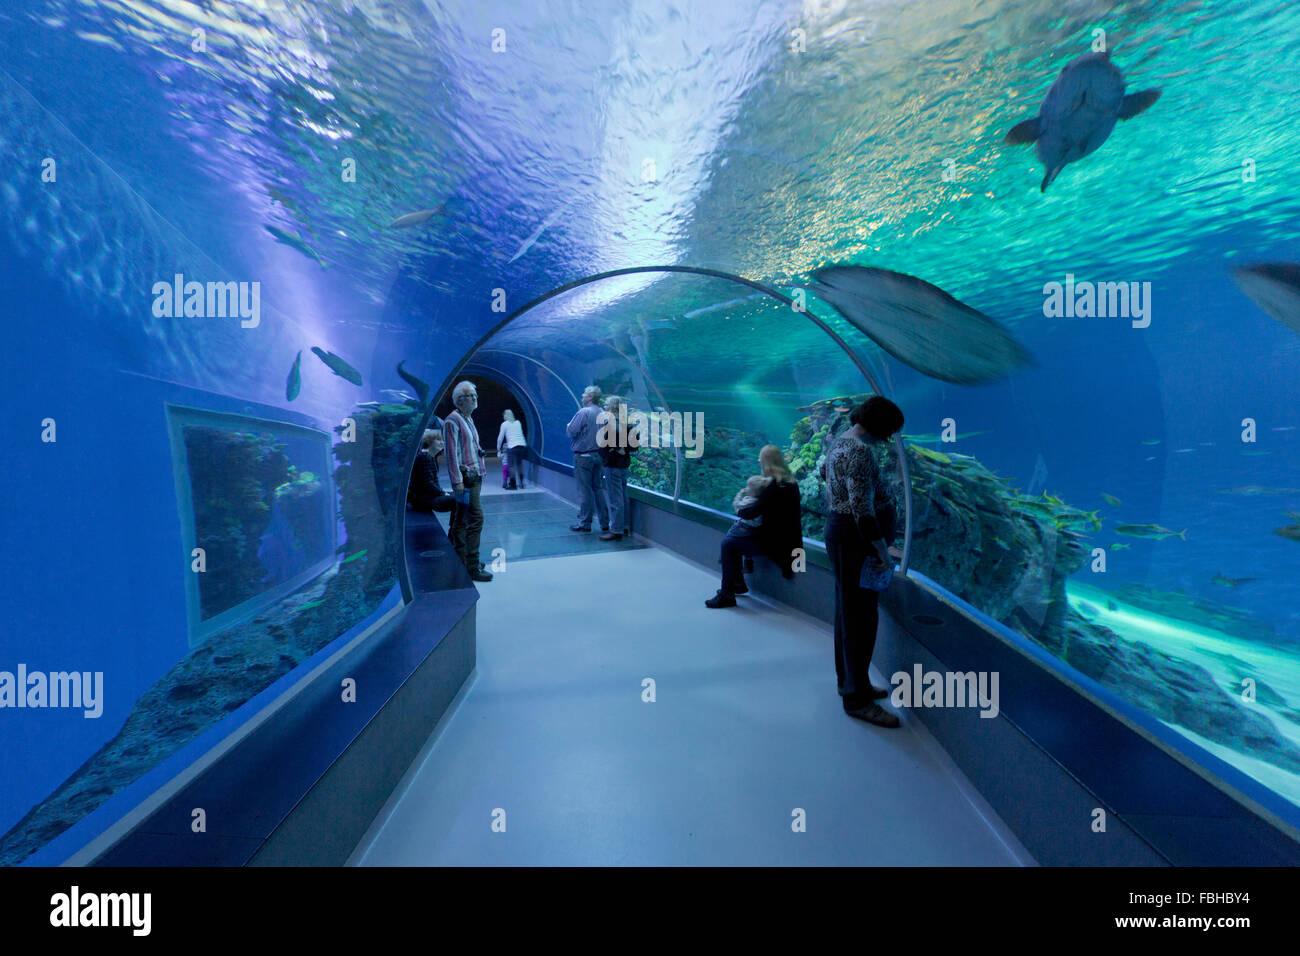 Tunnel, Den Blå Planet, Bleu Plante Aquarium, Copenhague, Danemark Photo Stock